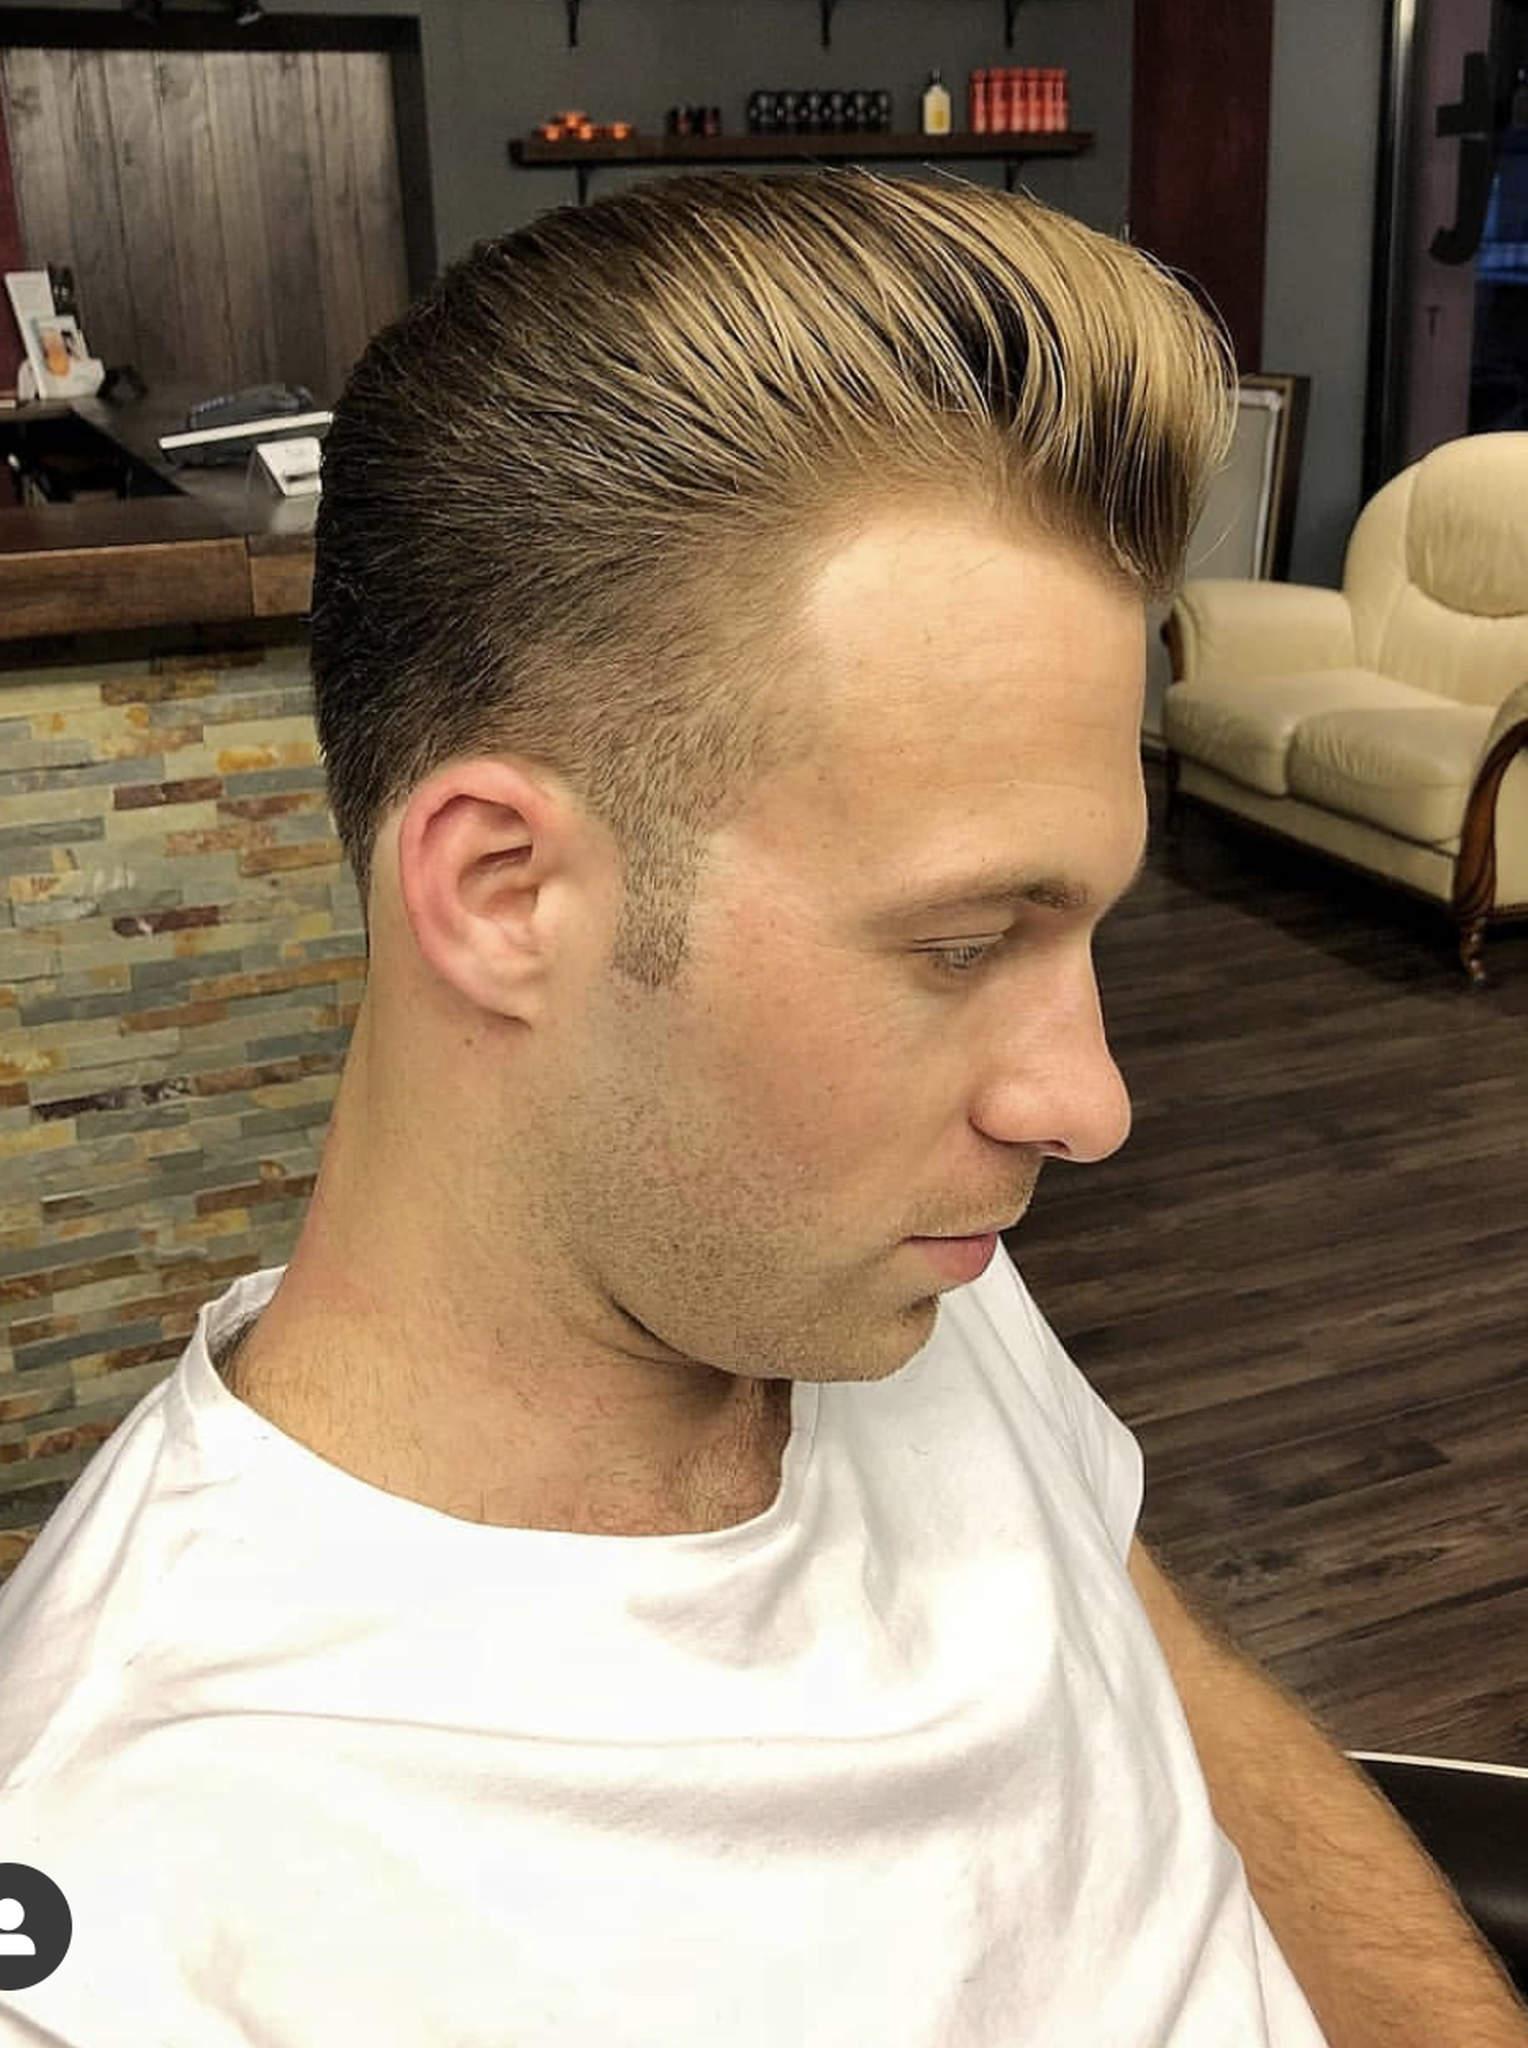 Modelowana, klasyczna fryzura męska